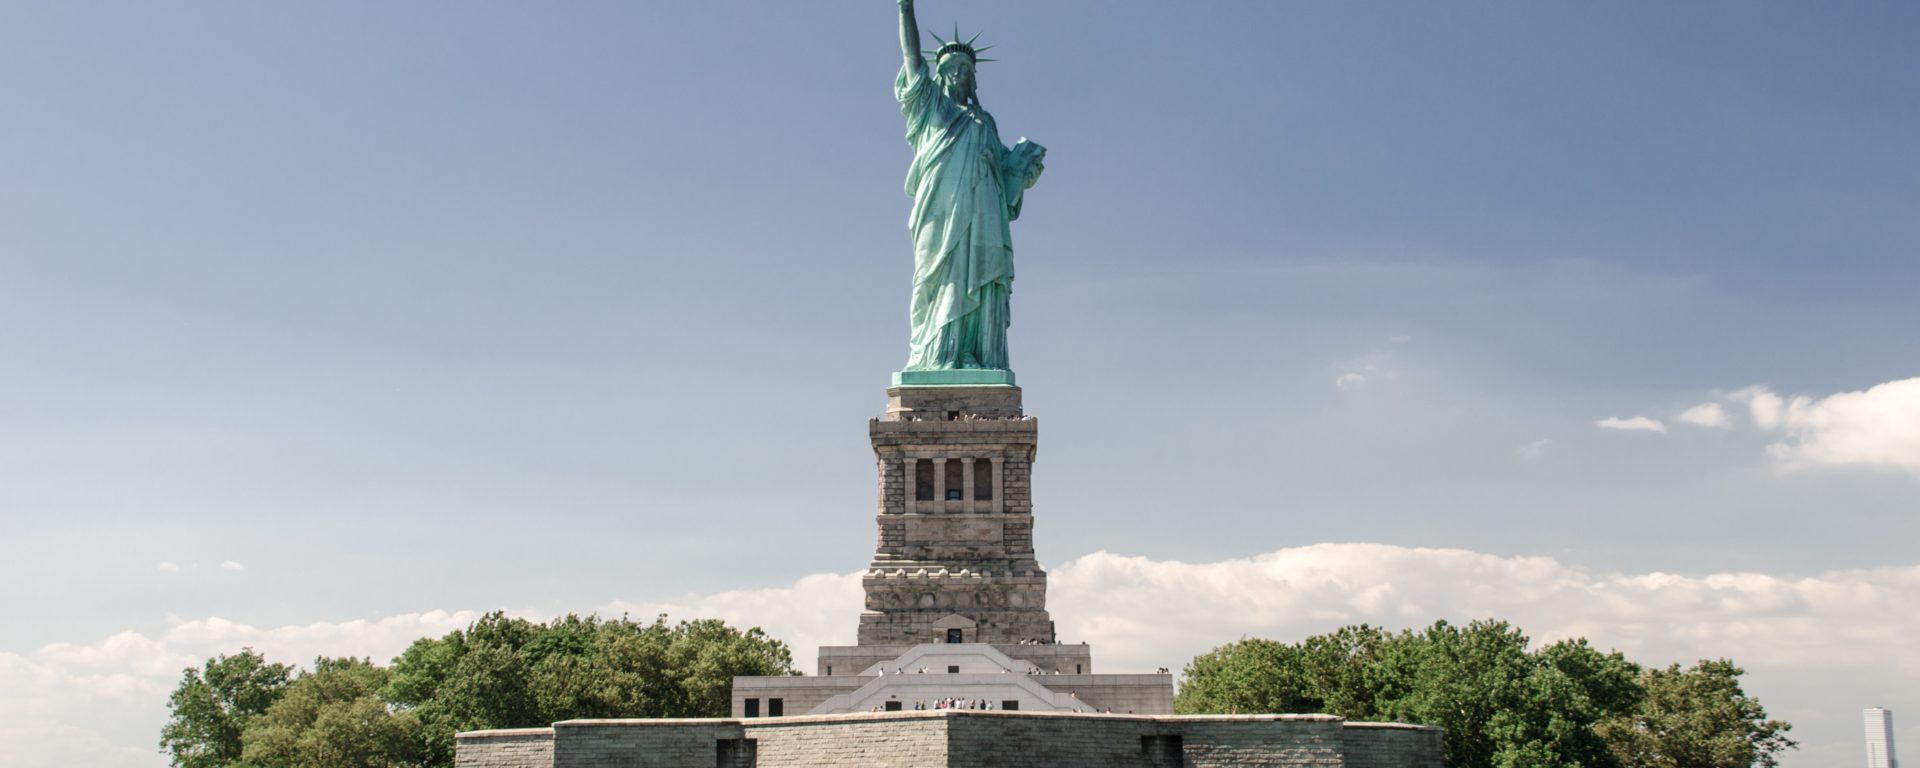 freiheitsstatue new york city liberty statue nmun StockSnap_LC4ZX2SRSV